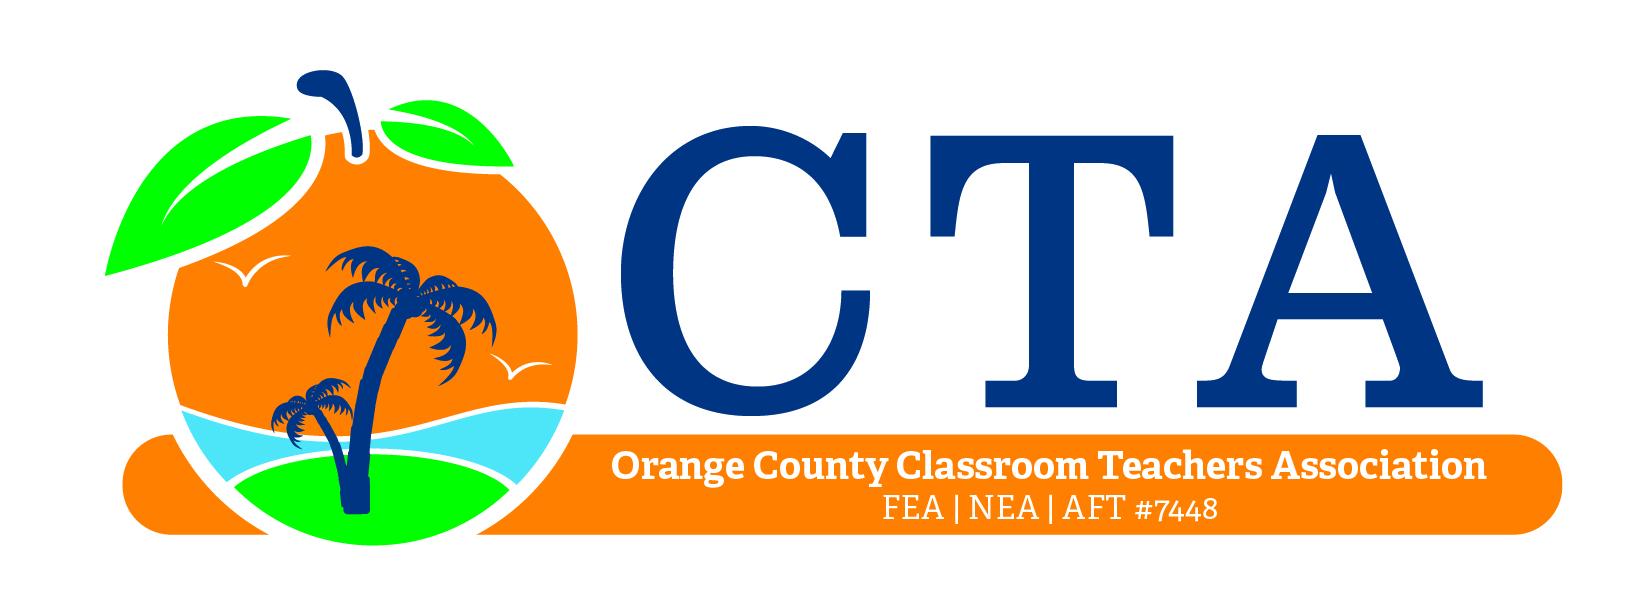 Orange County Classroom Teachers Association